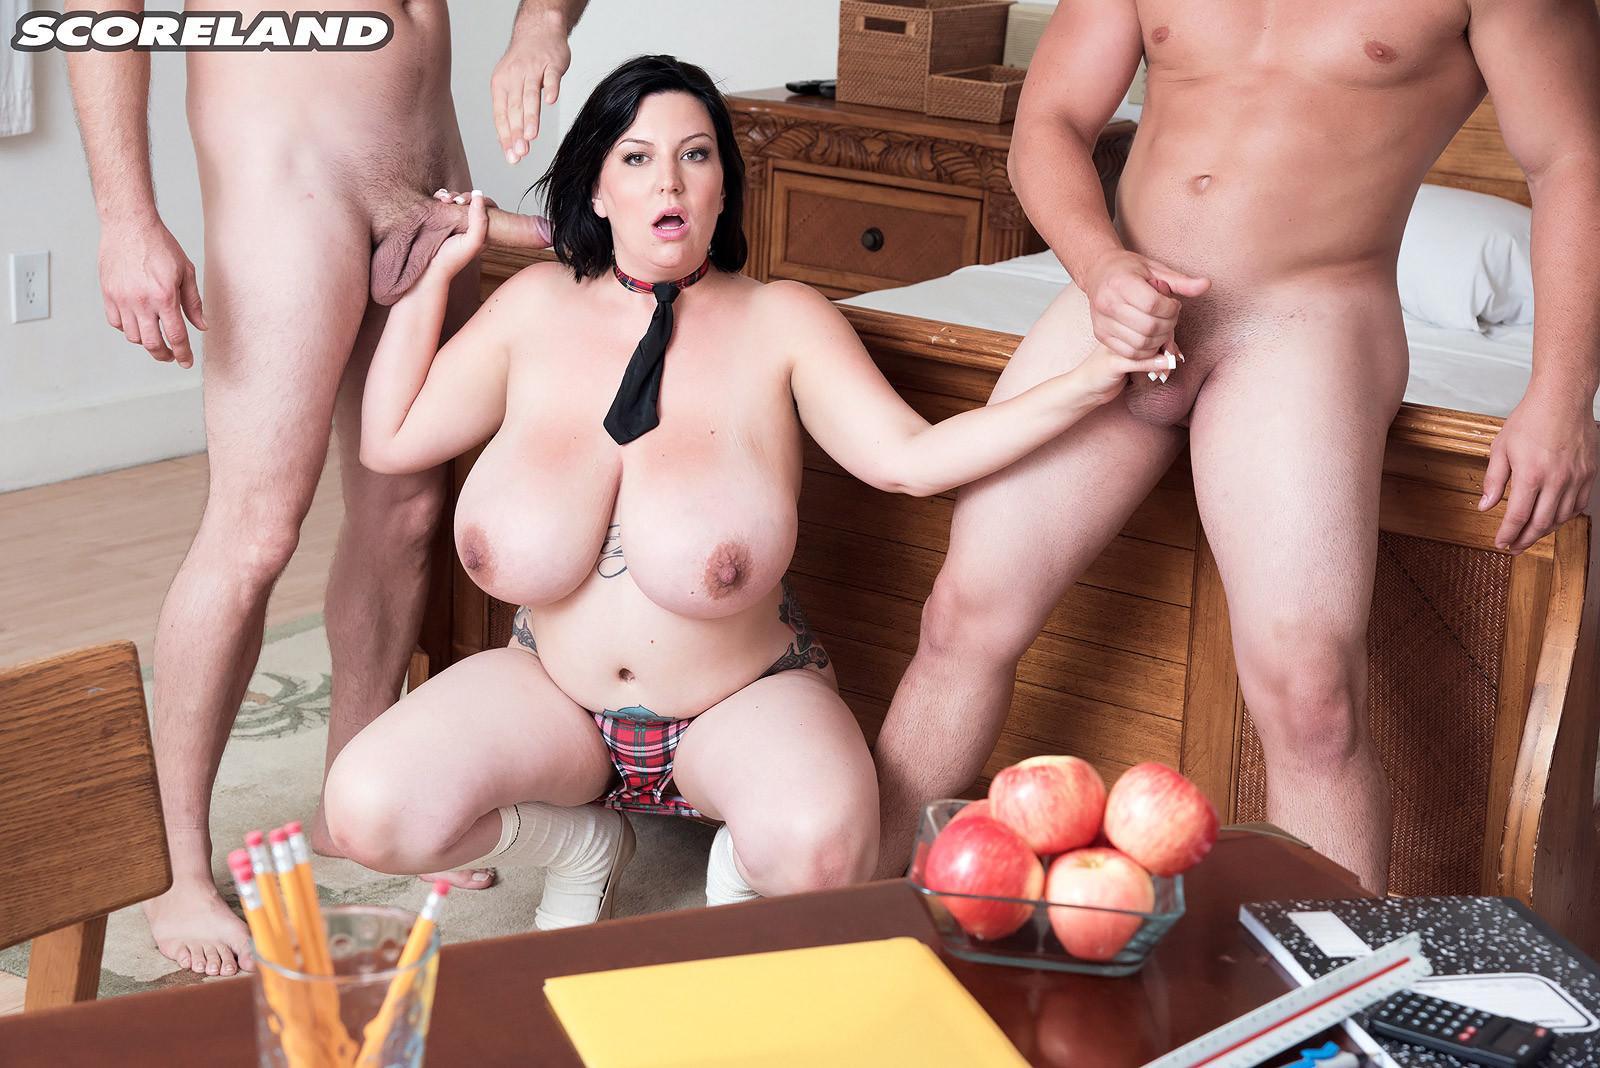 Naked girld pussy pics